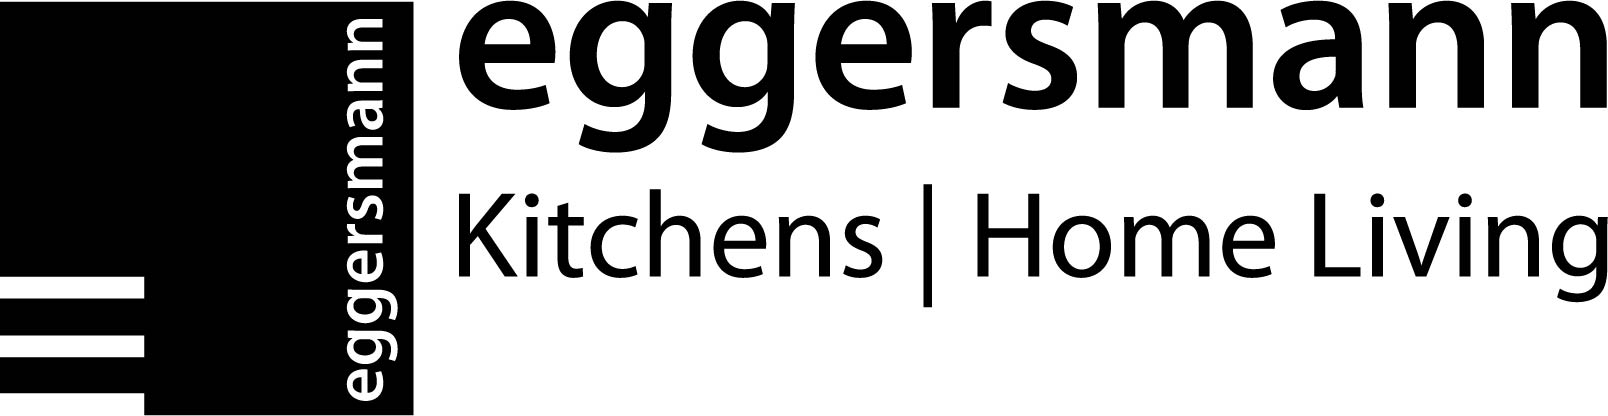 2019 ENLACES - eggersmann logo